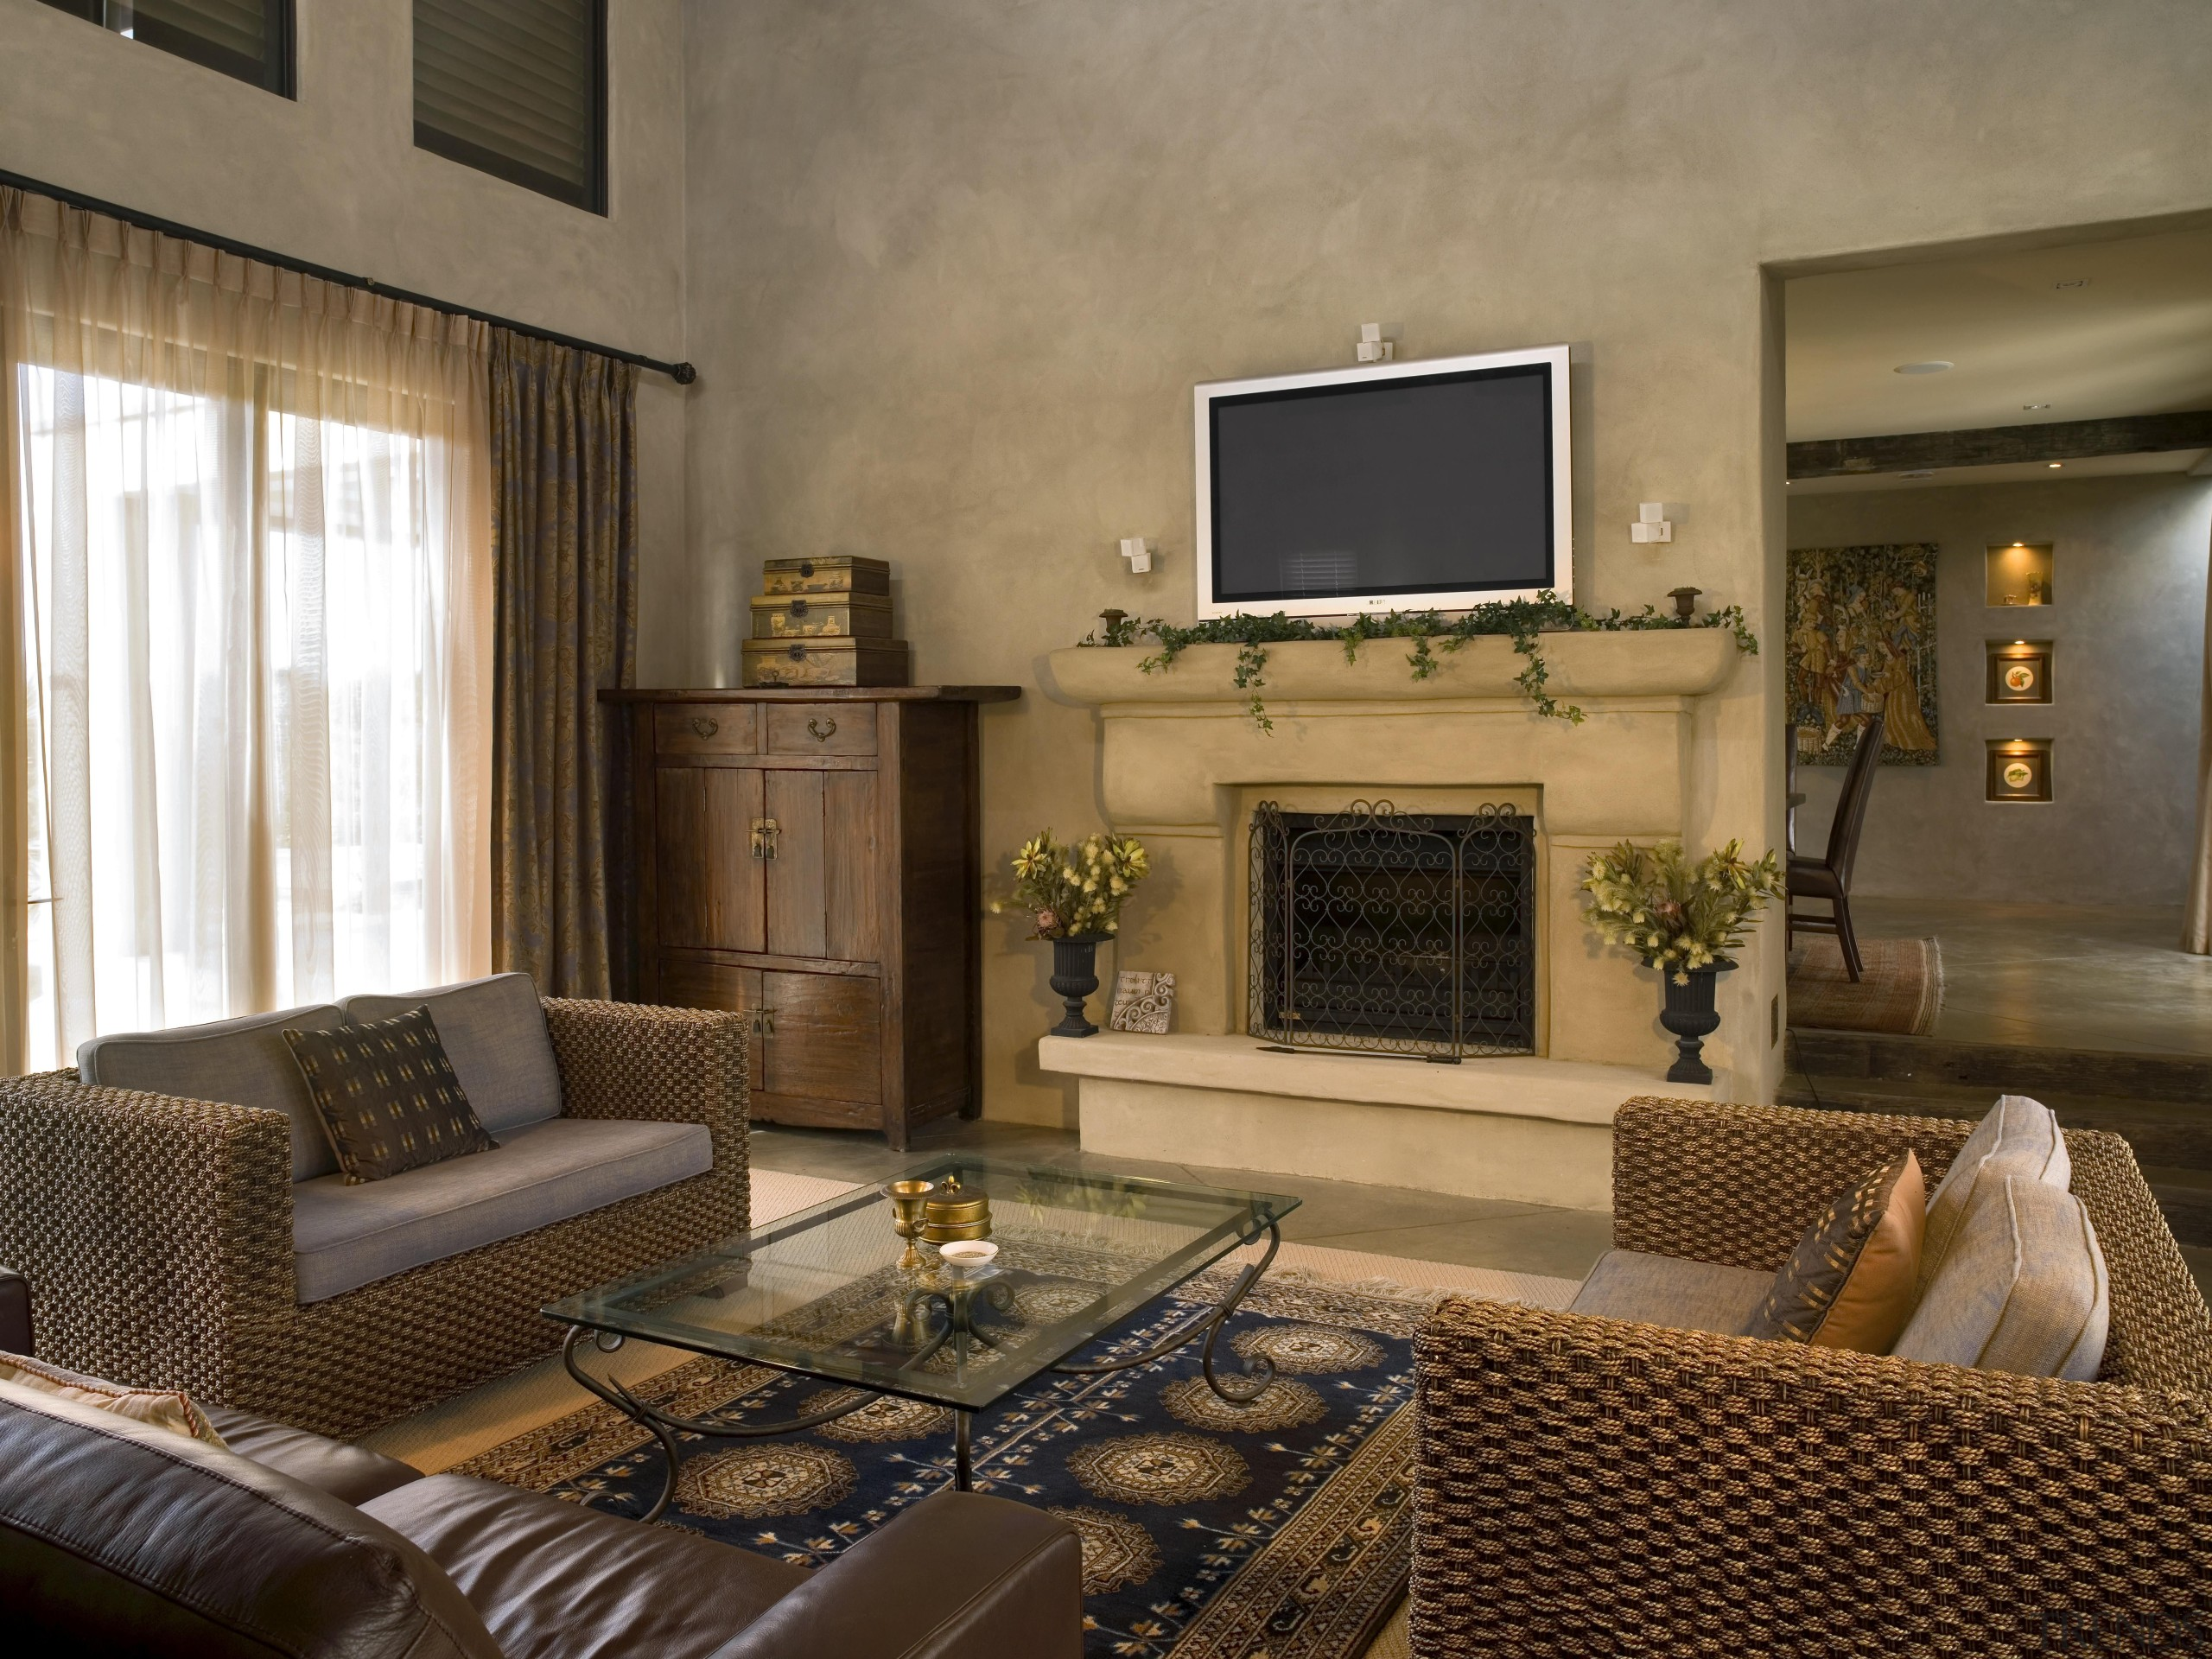 173mangawhai 16.jpg - 173mangawhai_16.jpg - ceiling   fireplace ceiling, fireplace, home, interior design, living room, property, real estate, room, brown